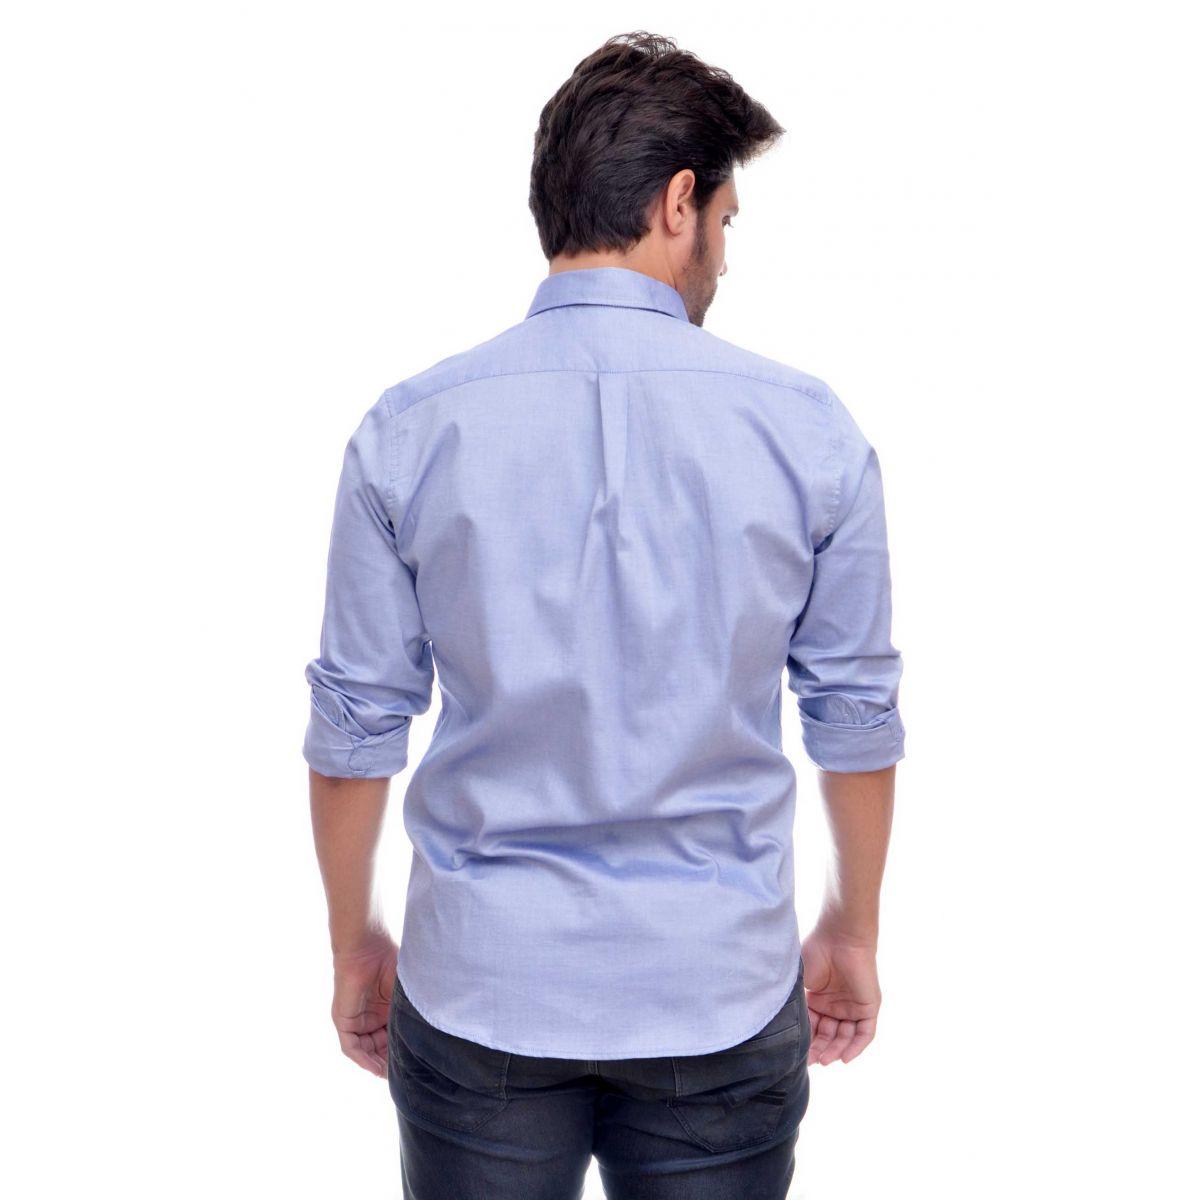 Camisa Social RL Oxford Azul Colored Regular Fit  - Ca Brasileira